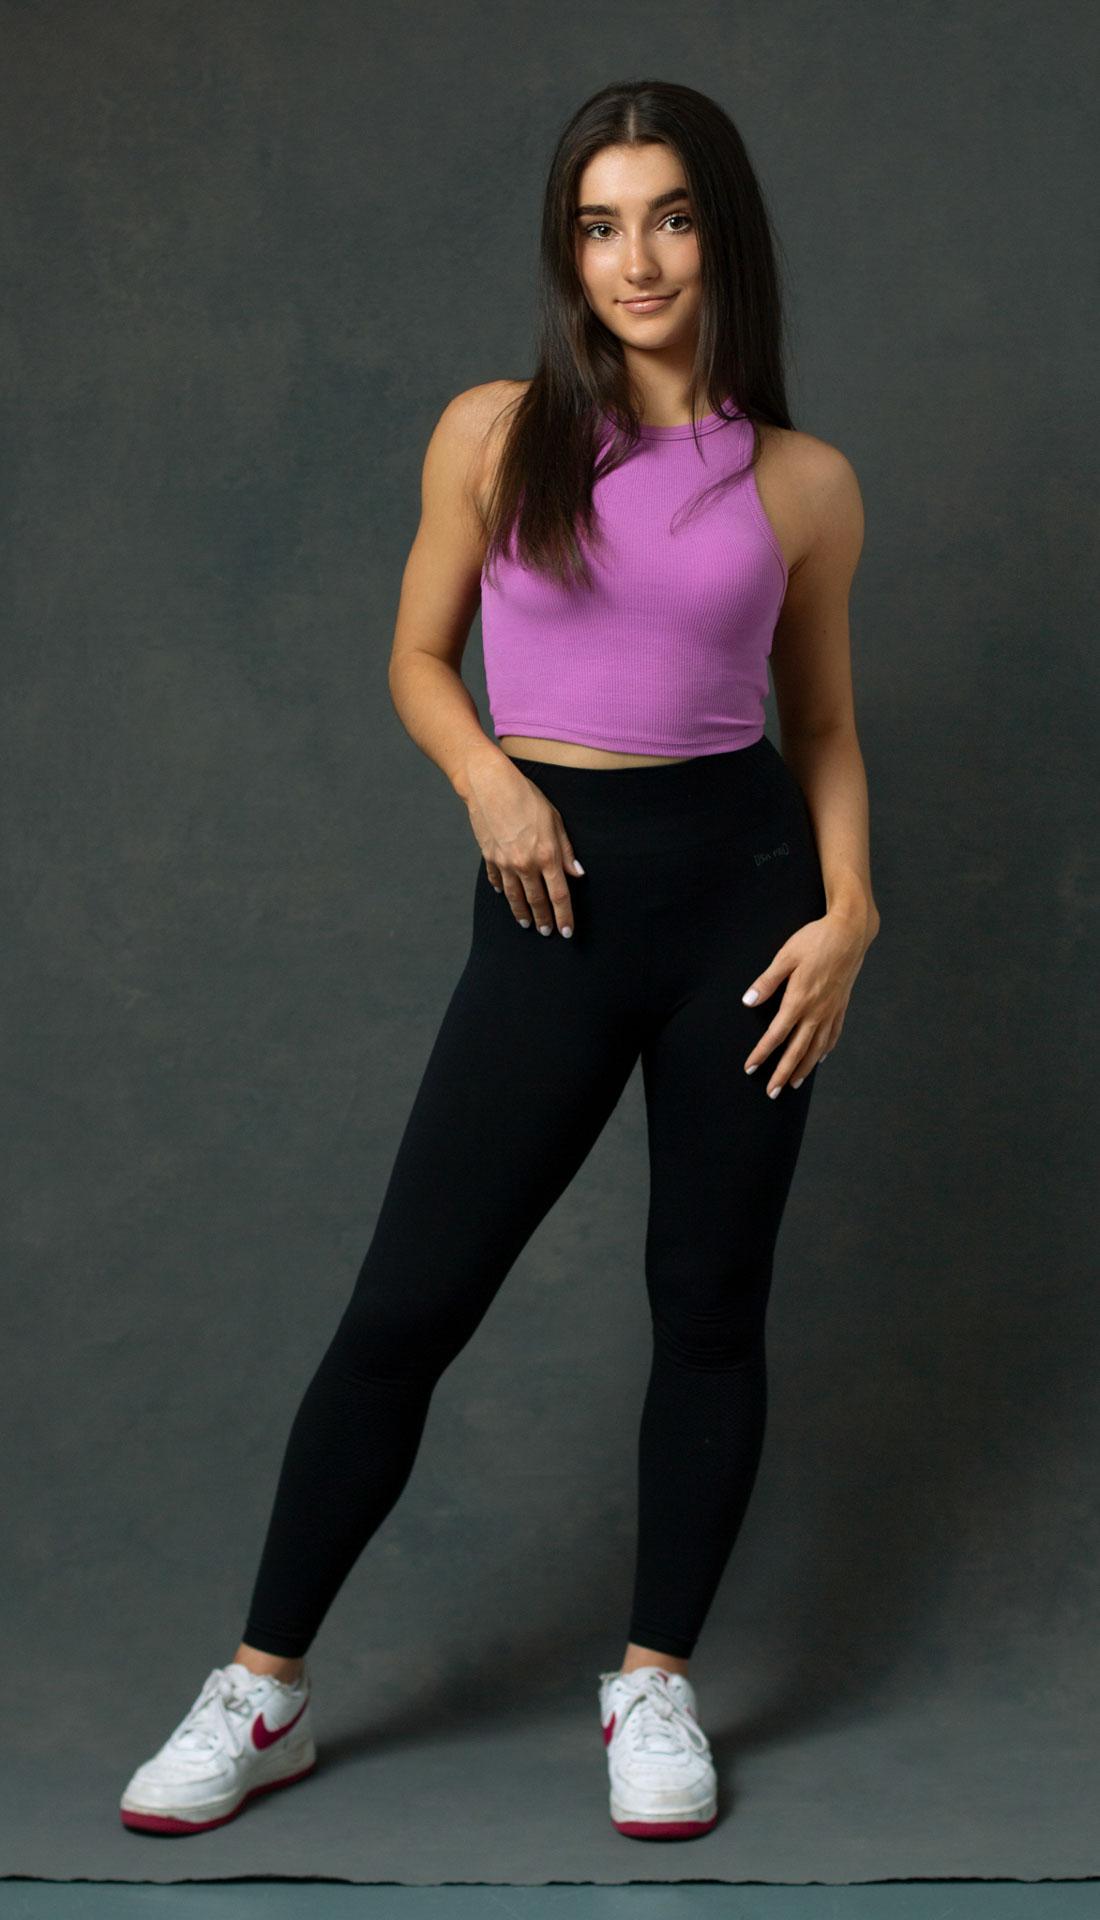 Dance portfolio photoshoot with Birmingham dancer and actor Monica